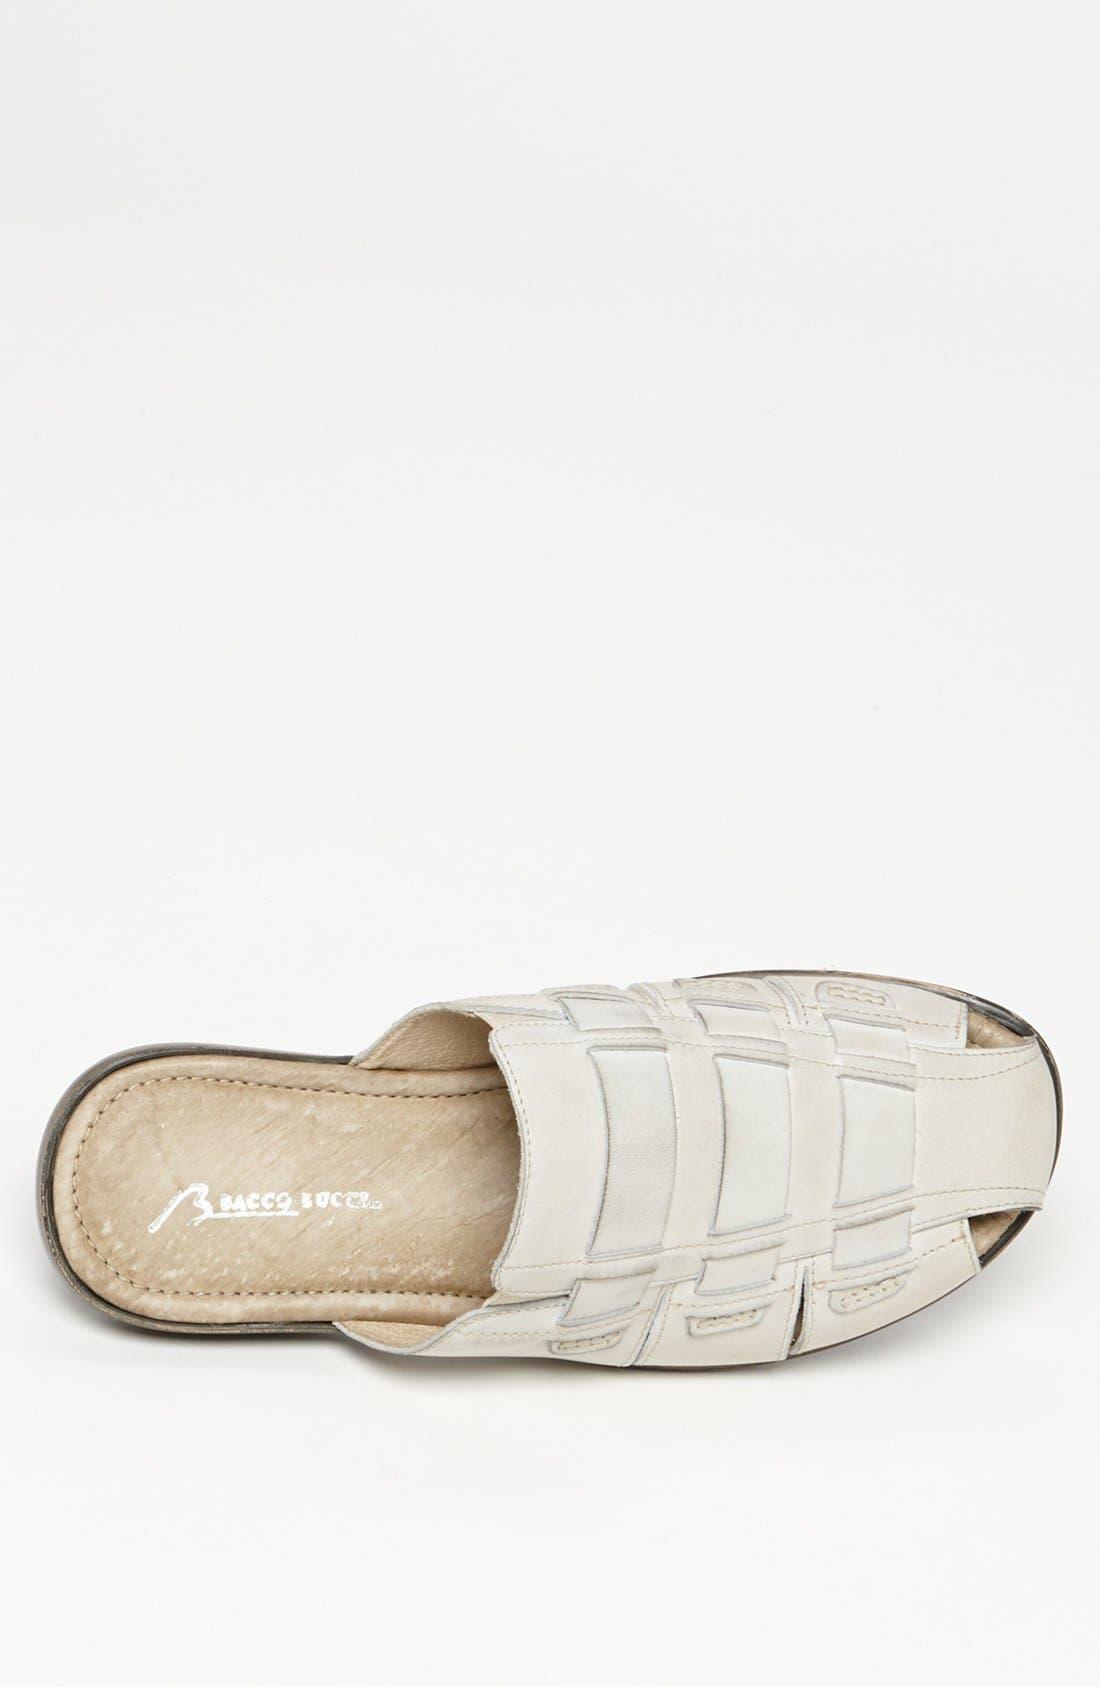 Alternate Image 3  - Bacco Bucci 'Ruggeri' Sandal (Men)